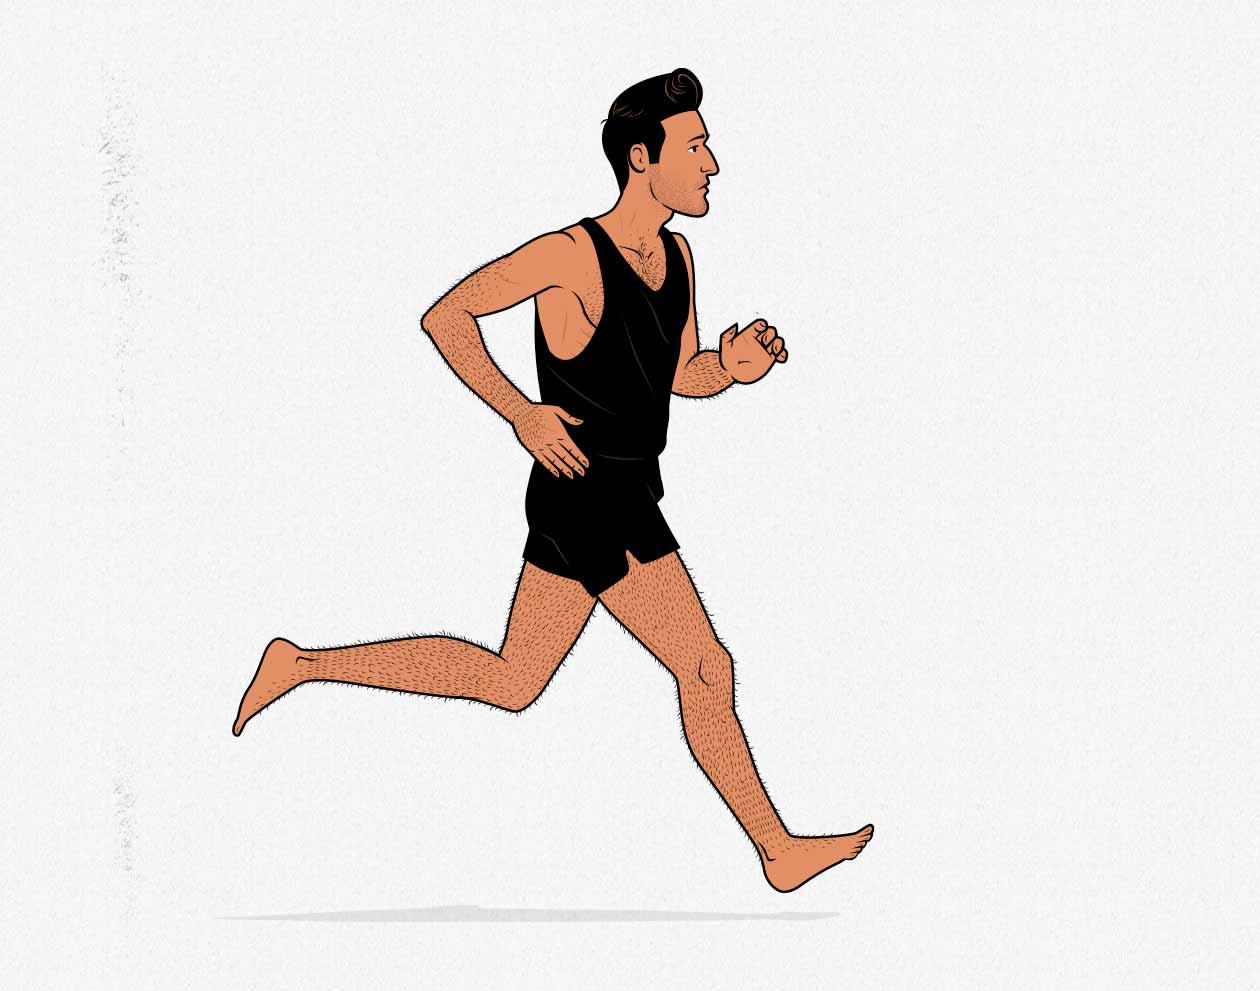 Illustration of a skinny guy doing cardio.